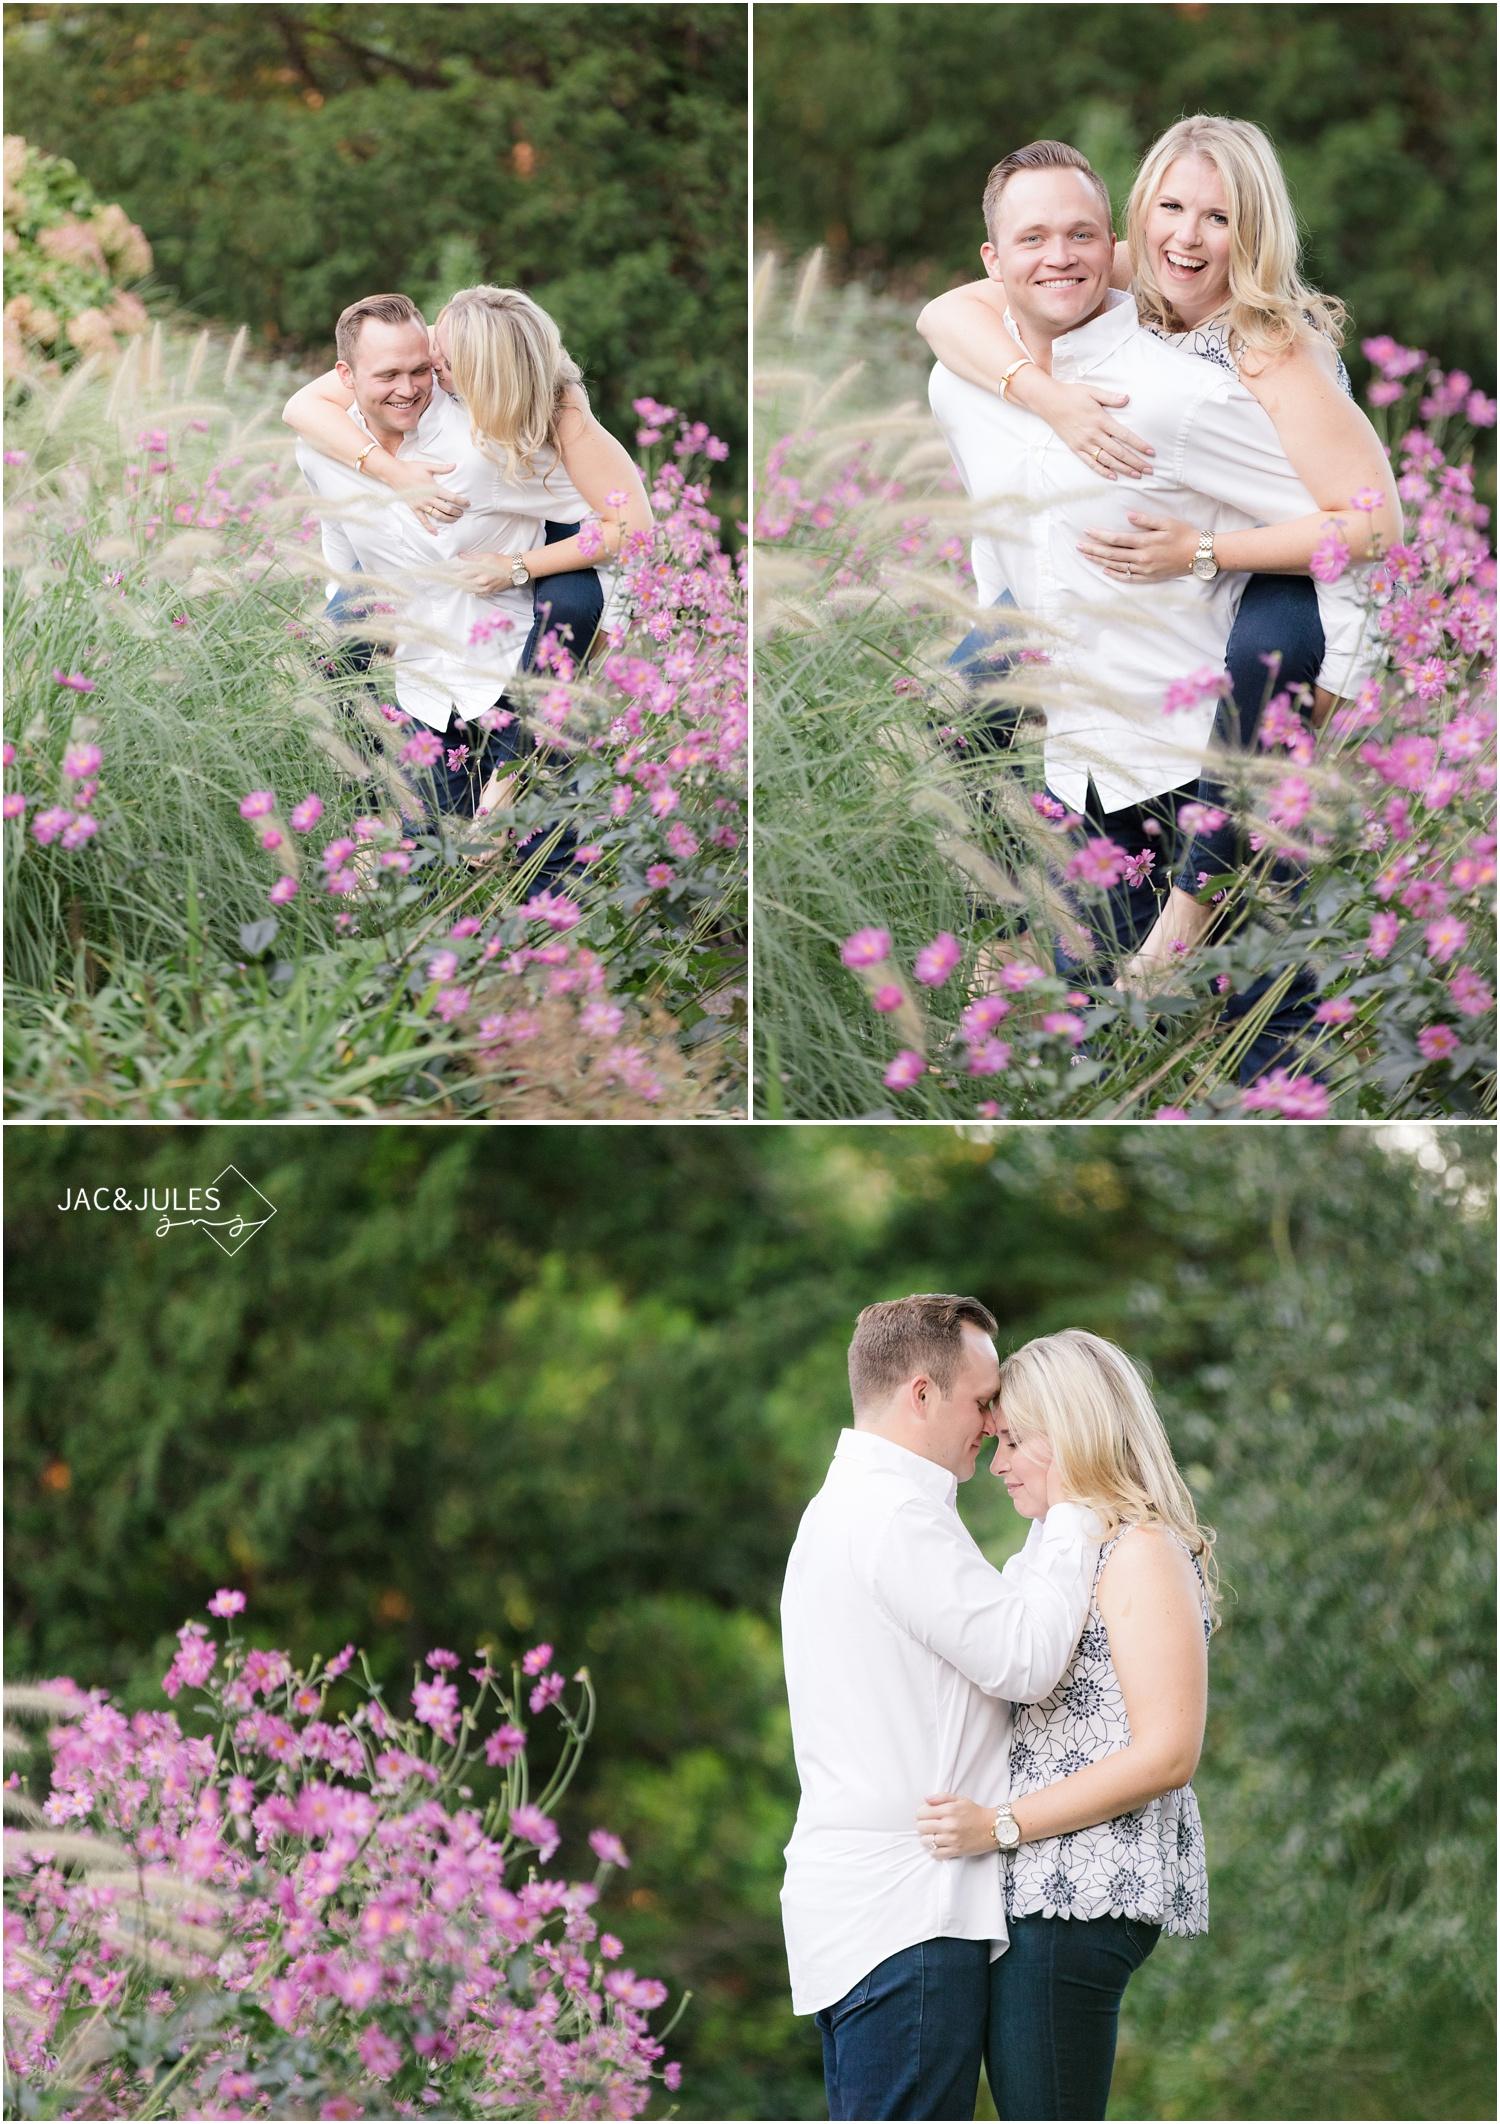 pretty romantic fun Engagement photos at Van Vleck House and Gardens in Montclair, NJ.